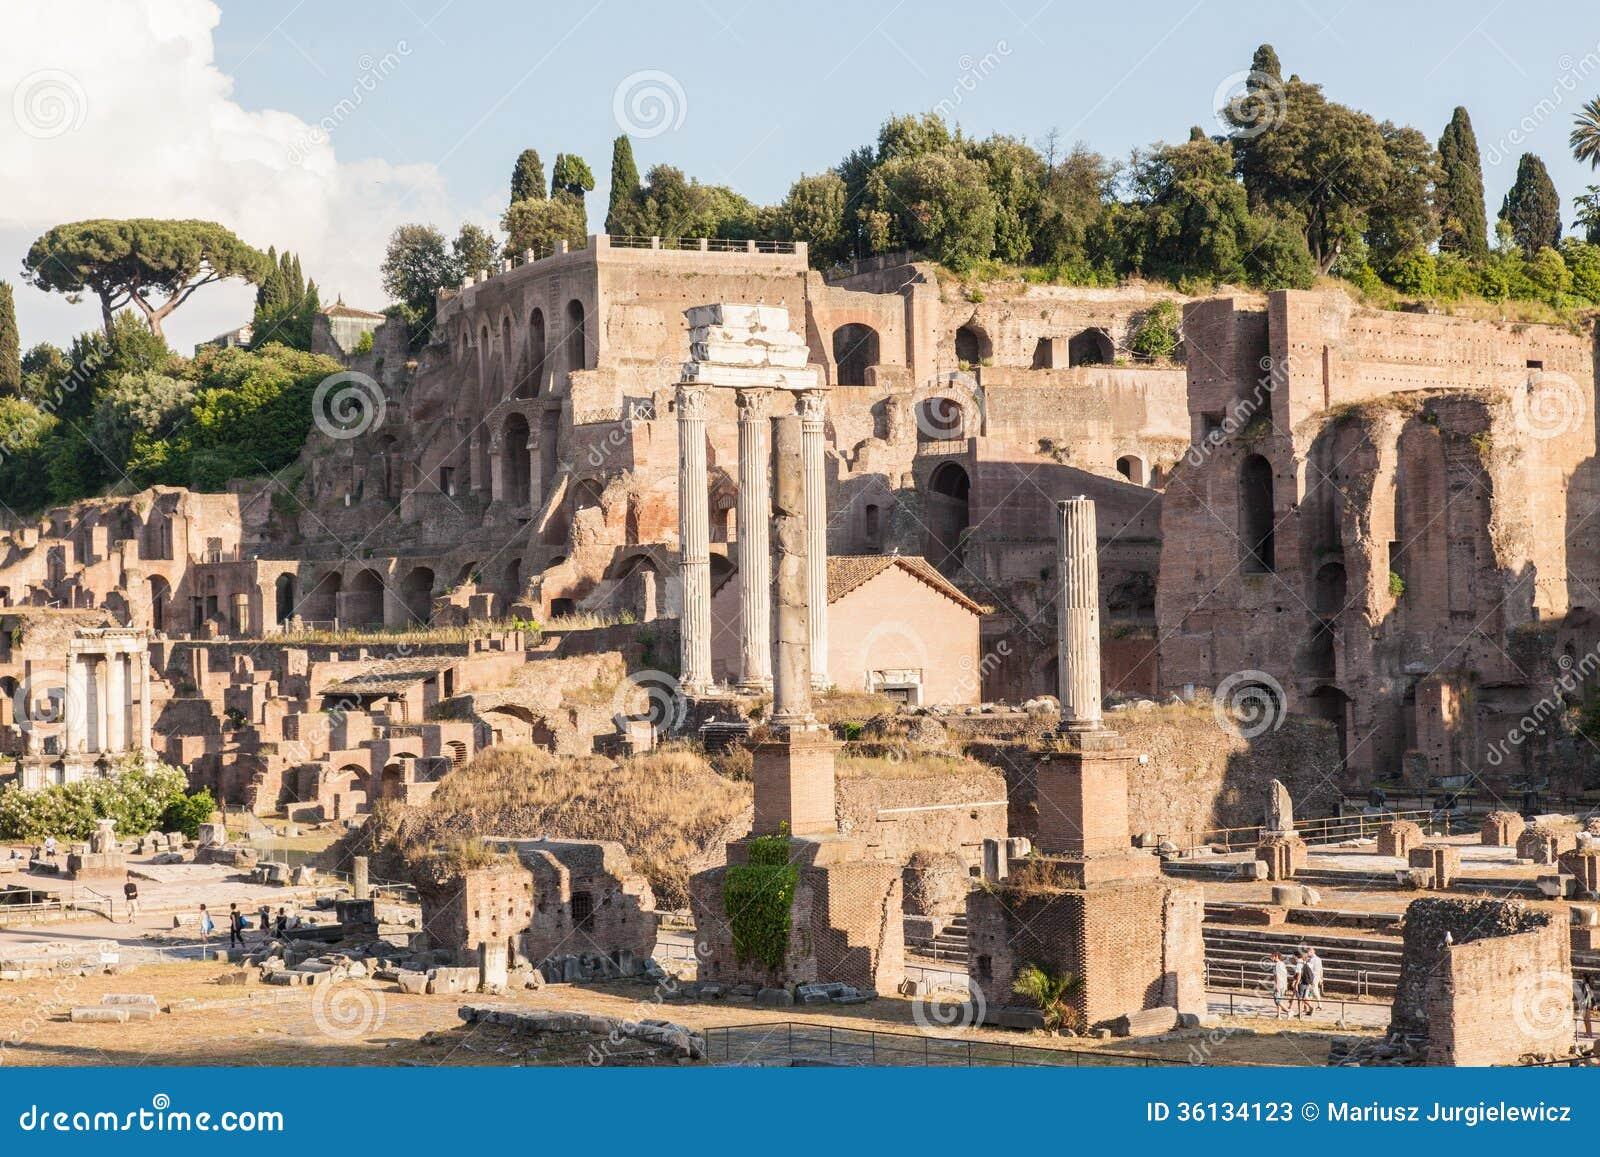 Forum Romanum, Stock Photos - Image: 36134123